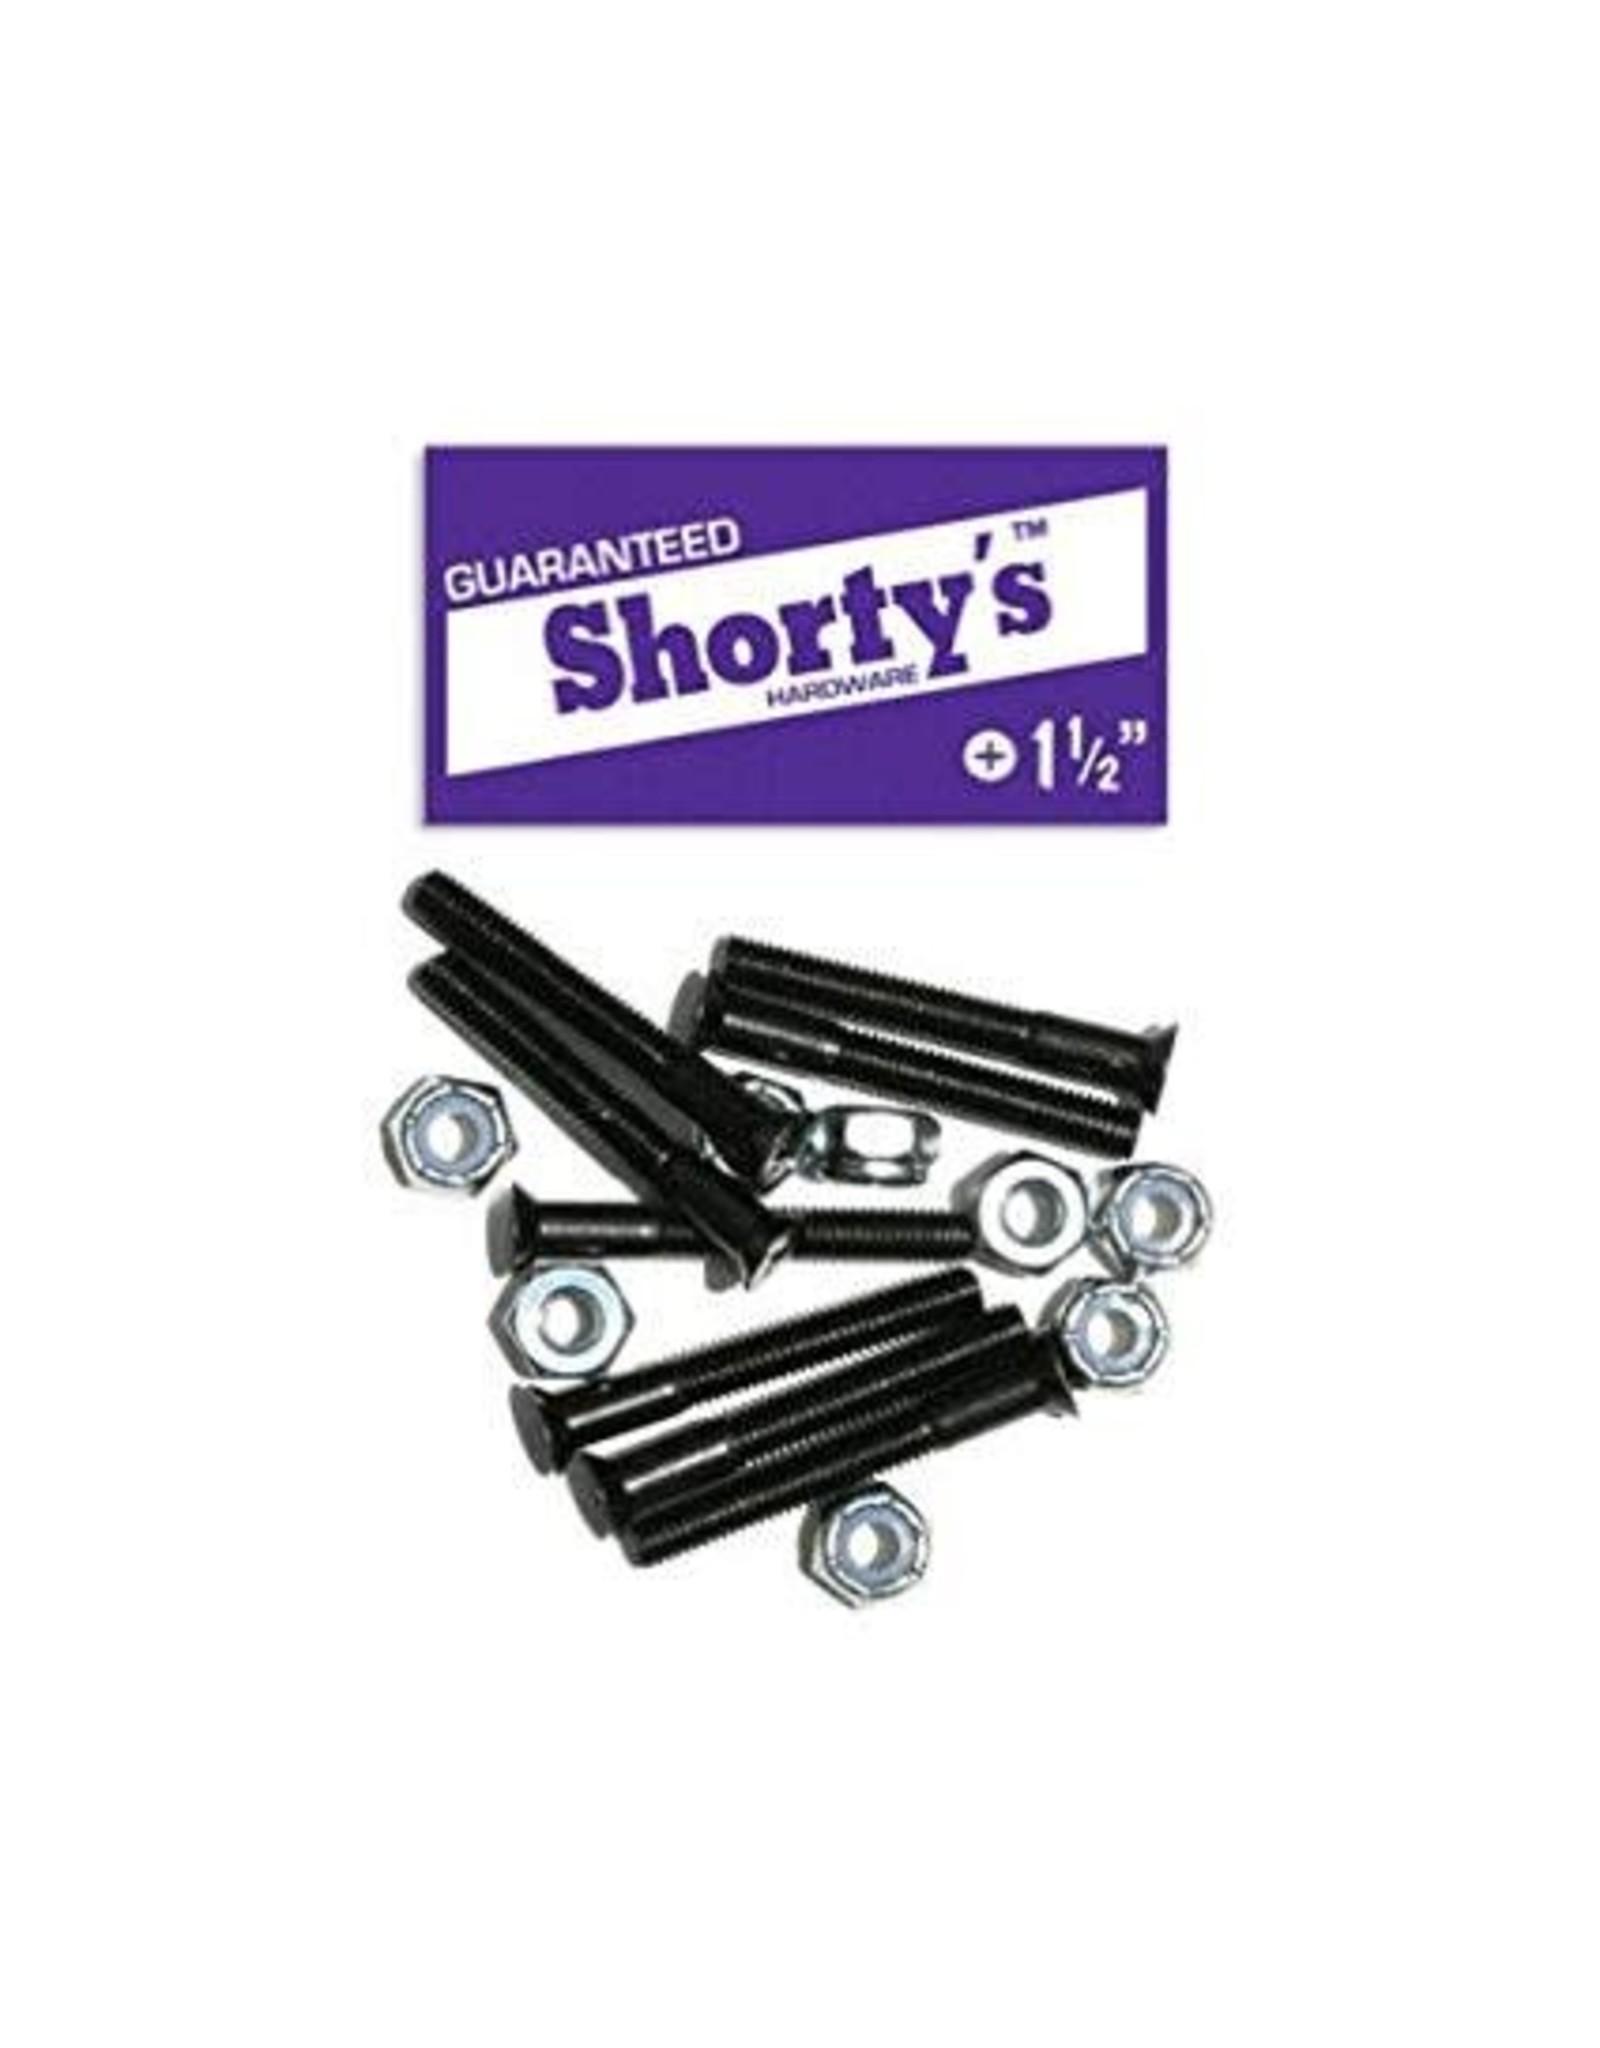 SHORTYS SHORTY'S SKATEBOARD HARDWARE